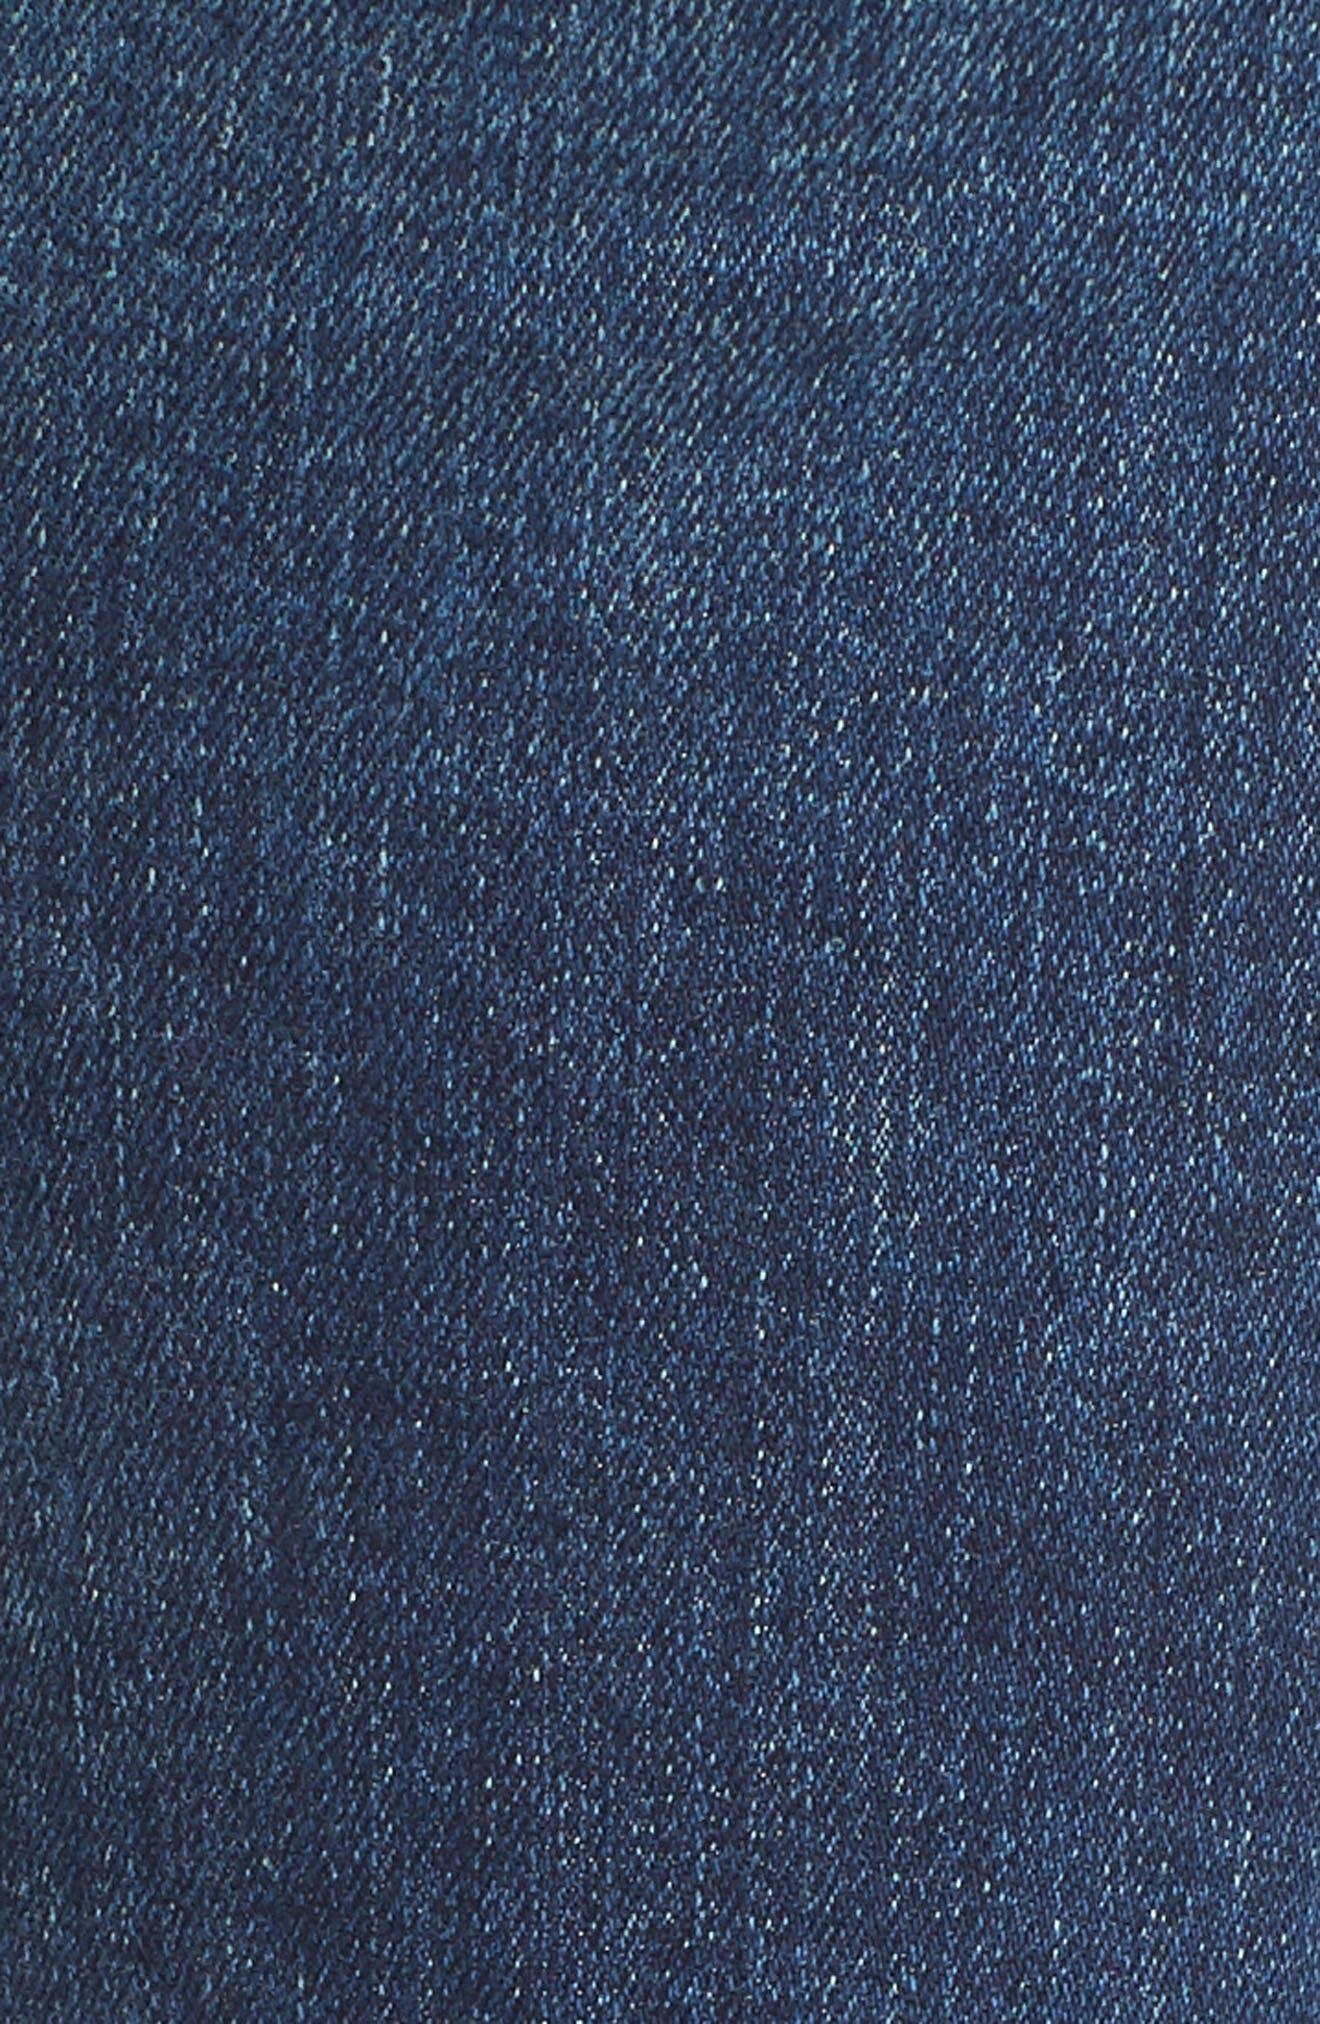 CITIZENS OF HUMANITY,                             Racer Slim Jeans,                             Alternate thumbnail 6, color,                             CASPIAN